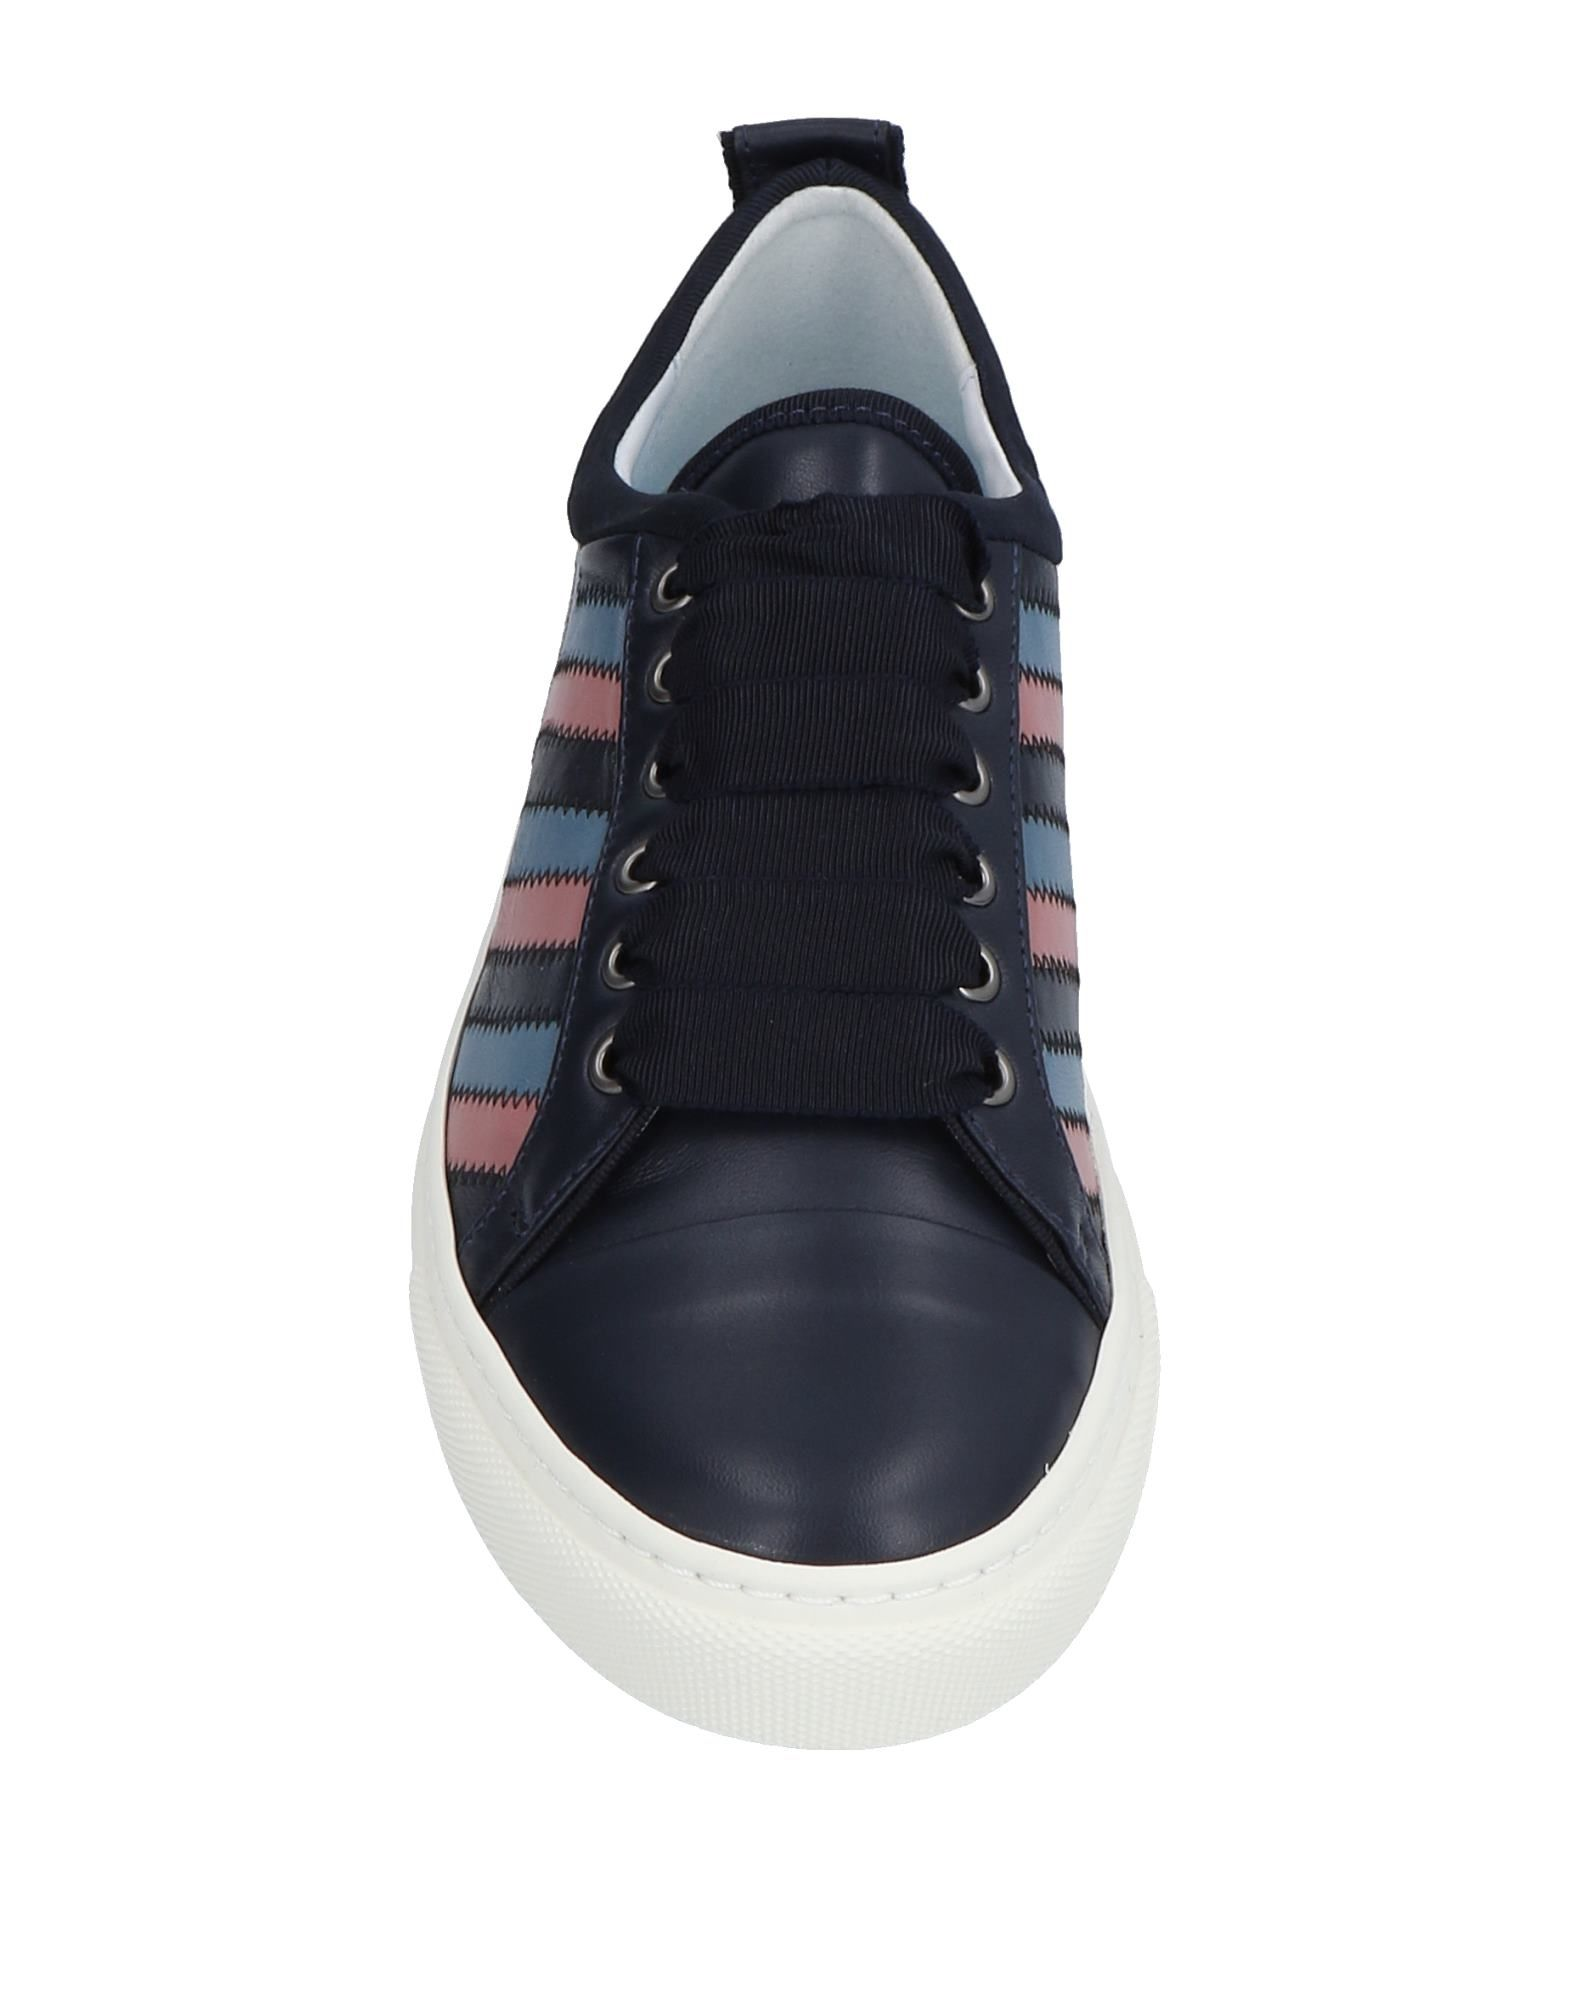 Lanvin Sneakers Damen Heiße  11499808NM Heiße Damen Schuhe 11bc4c